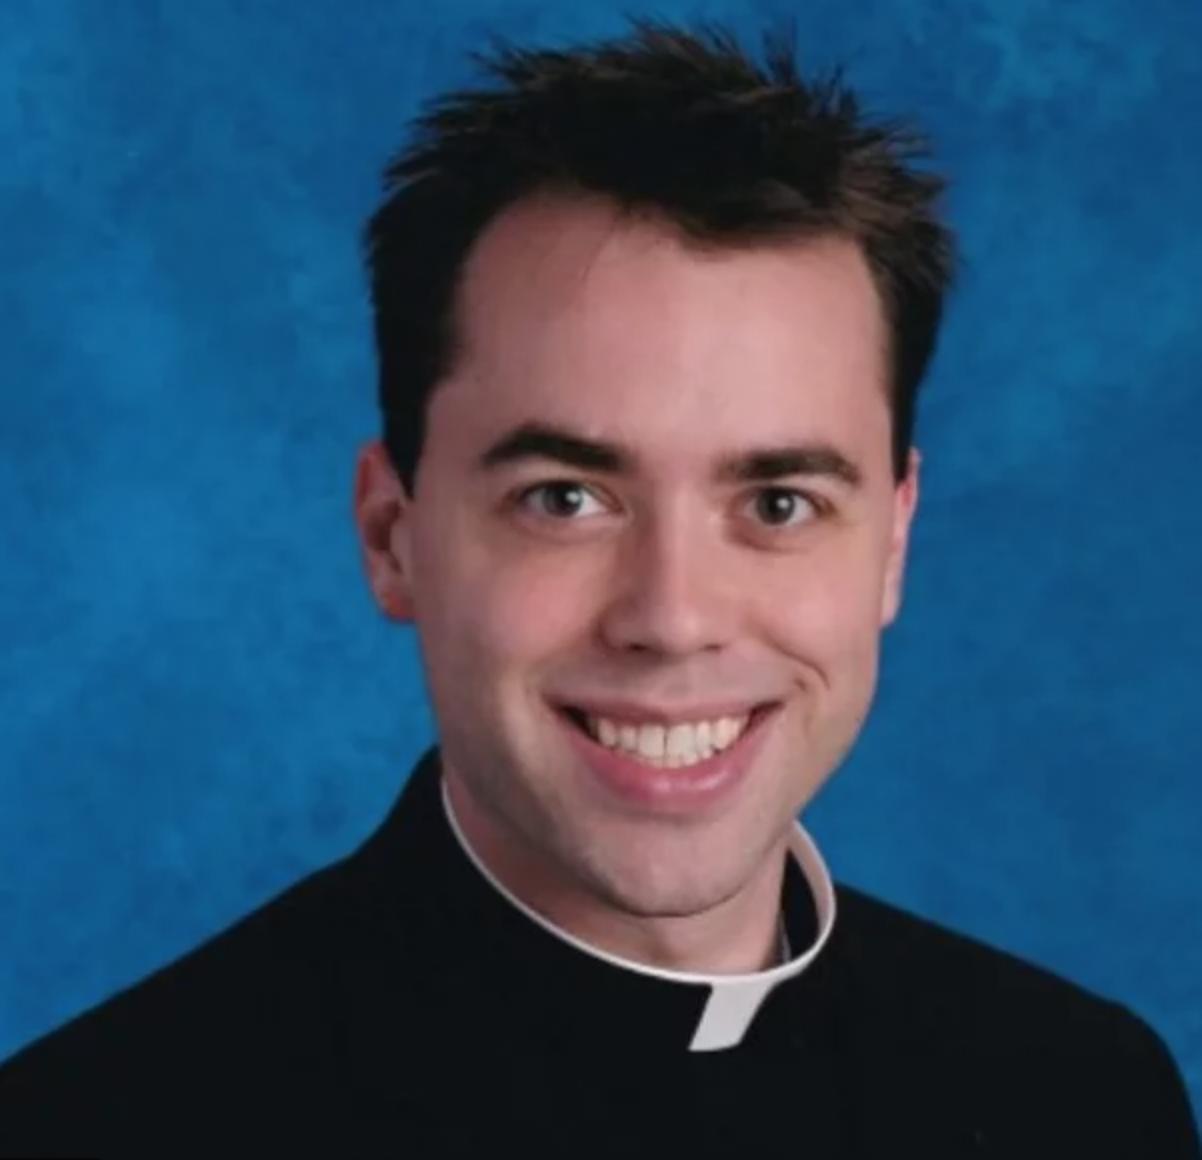 Rev. David Mowry